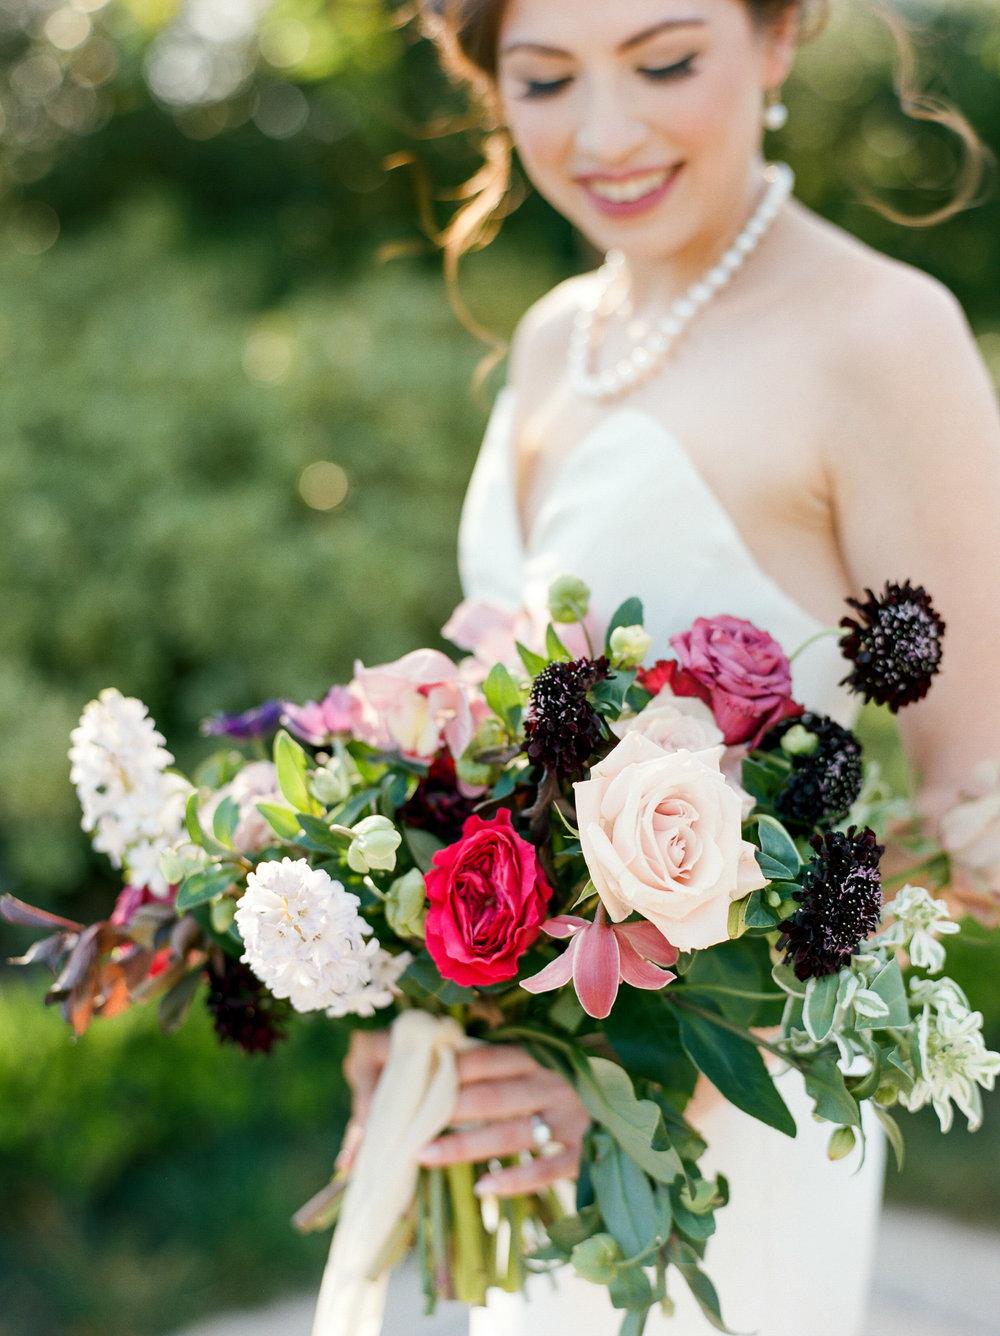 The-Knot-Texas-Magazine-Wedding-Top-Best-Houston-Wedding-Photographer-Fine-Art-Film-Dana-Fernandez-Photography-110.jpg